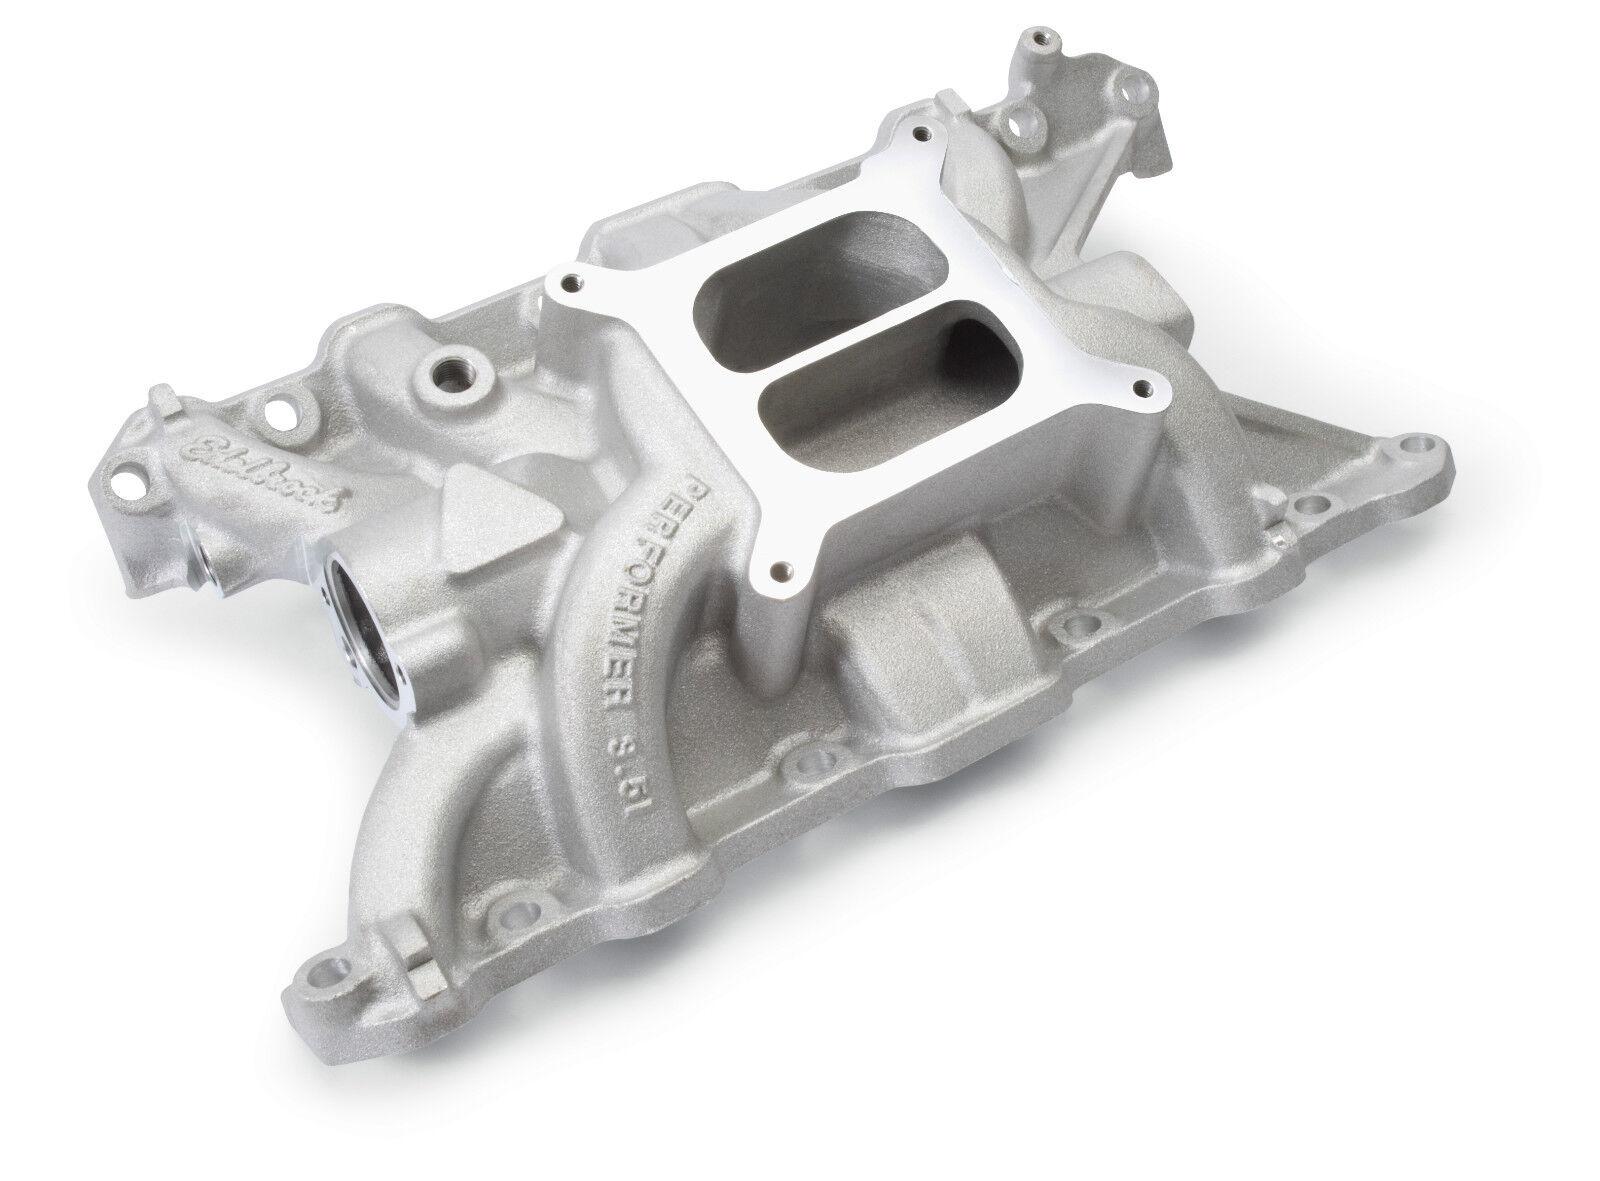 V8 Intake Manifold : Edelbrock buick rover v performer aluminum